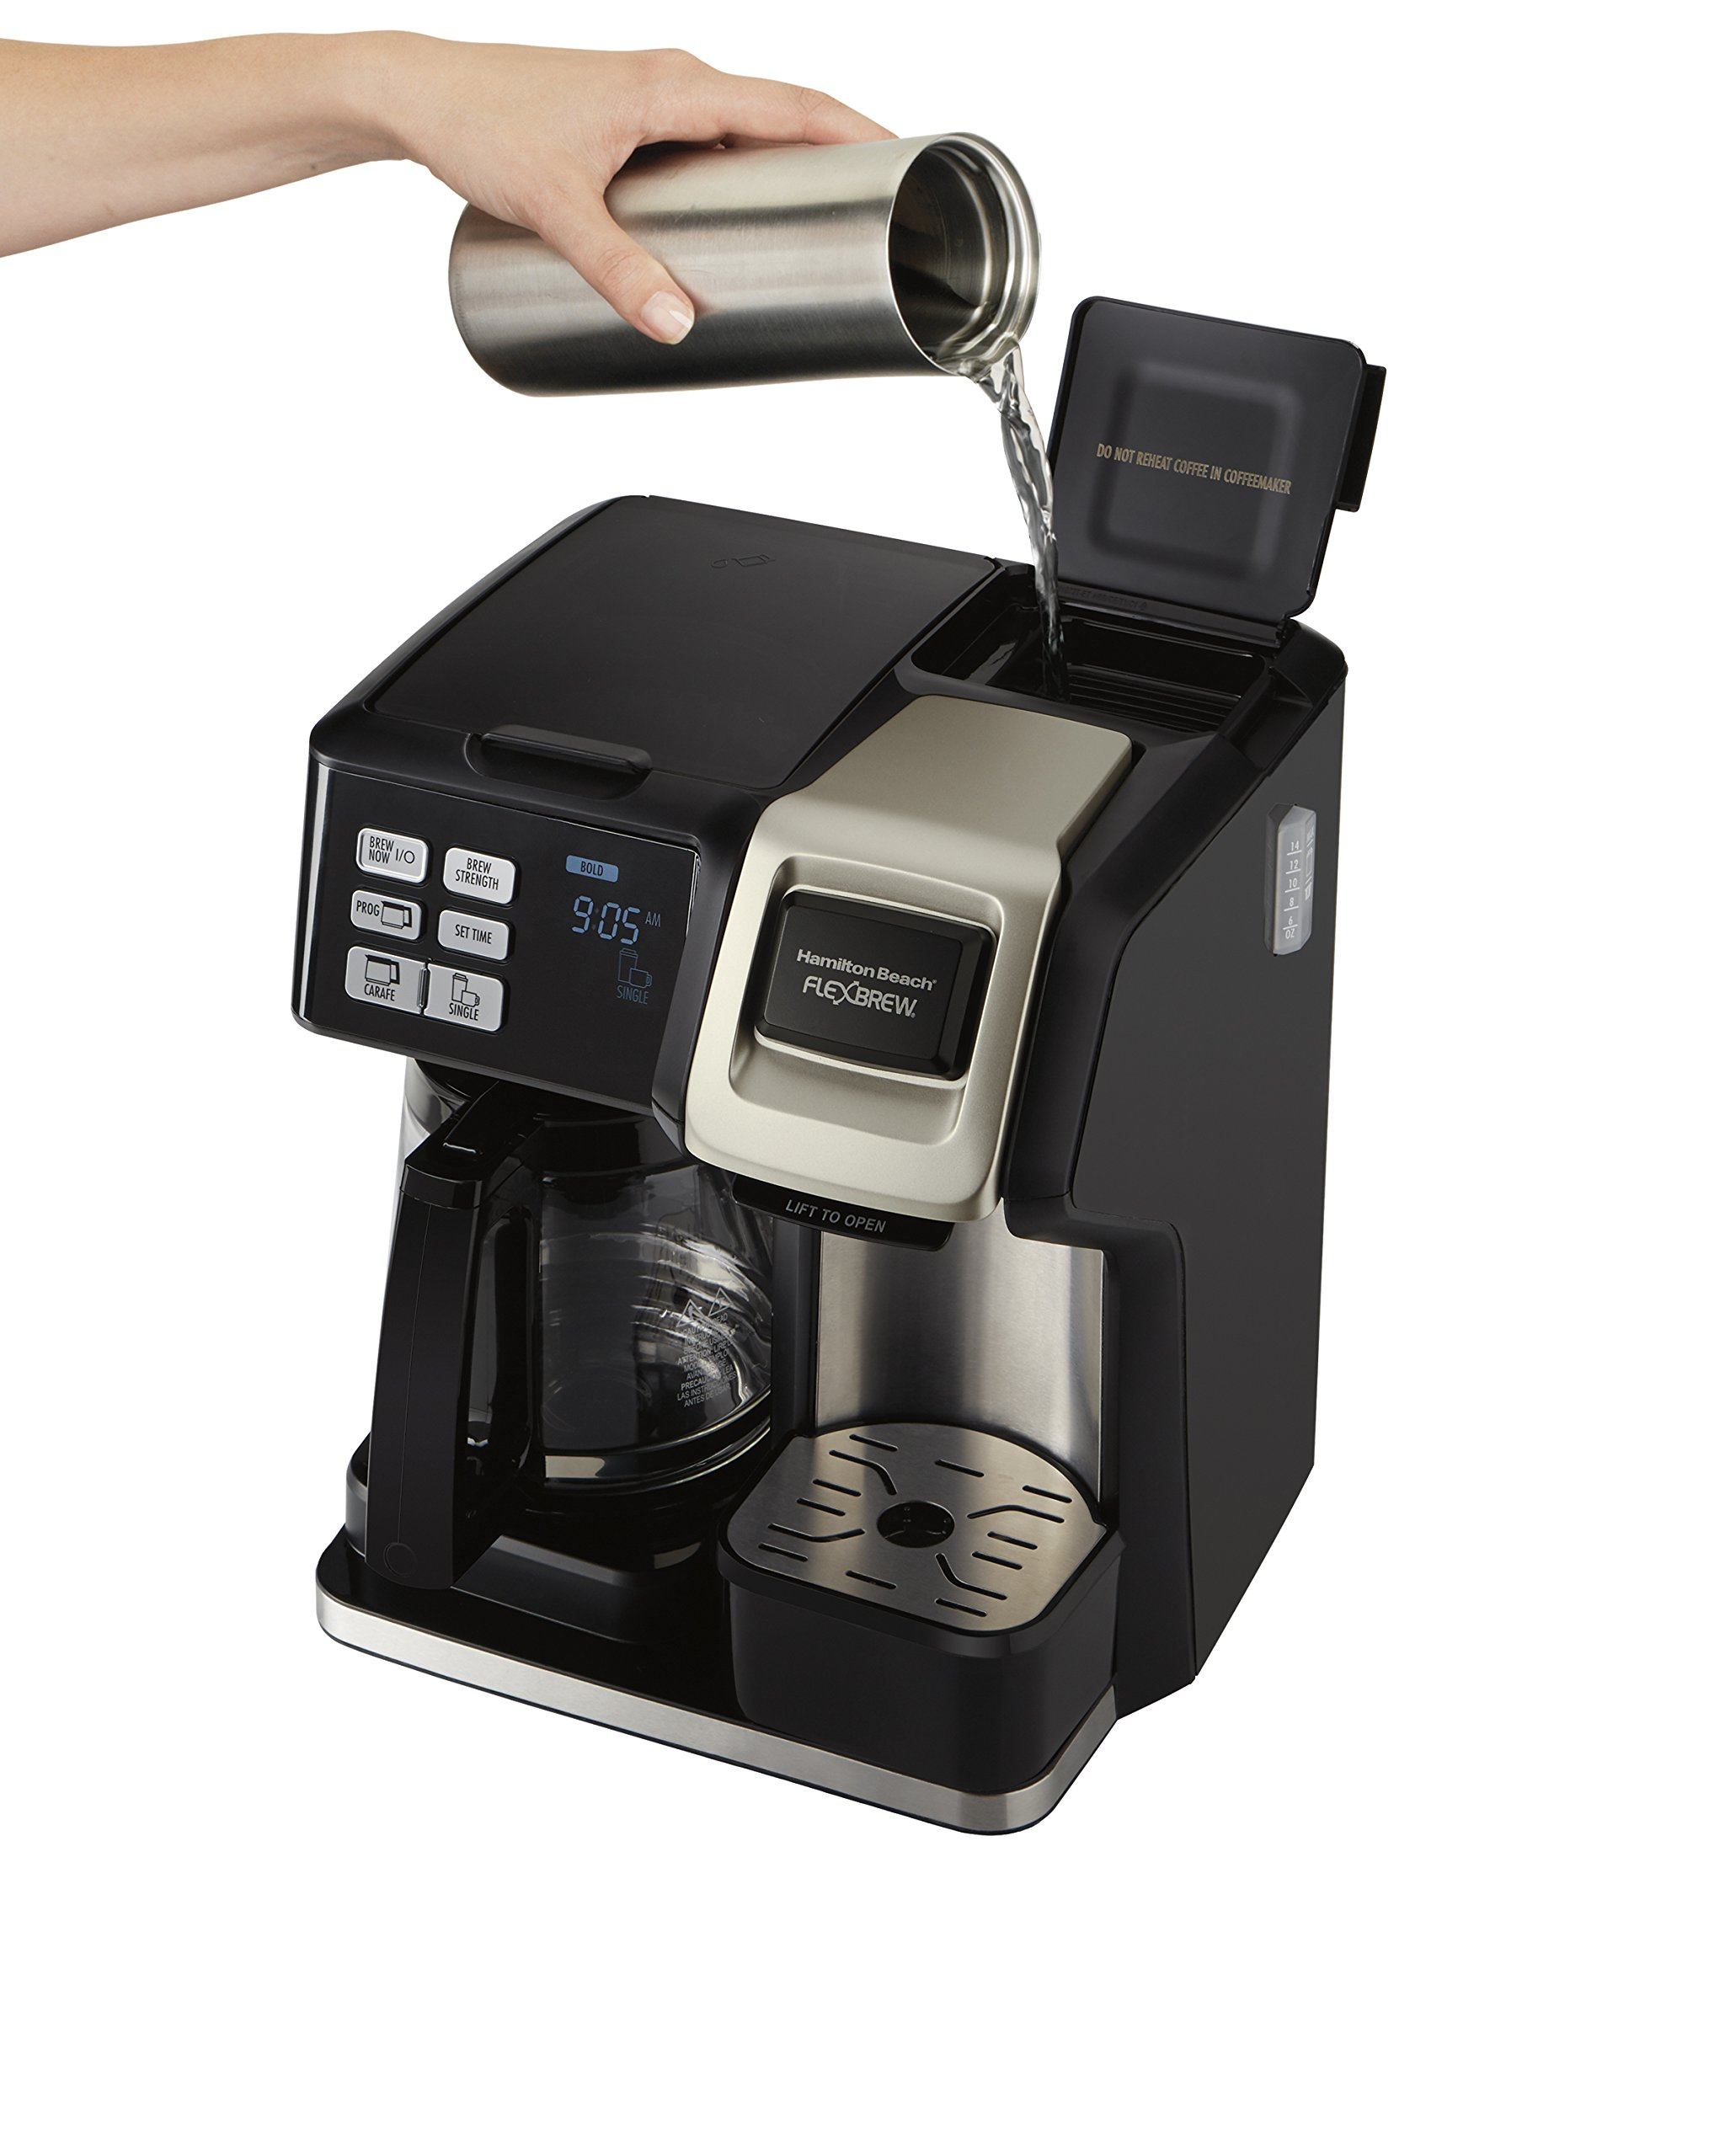 Hamilton Beach 49950C Flexbrew 2-Way Brewer Programmable Coffee Maker, Black by Hamilton Beach (Image #8)